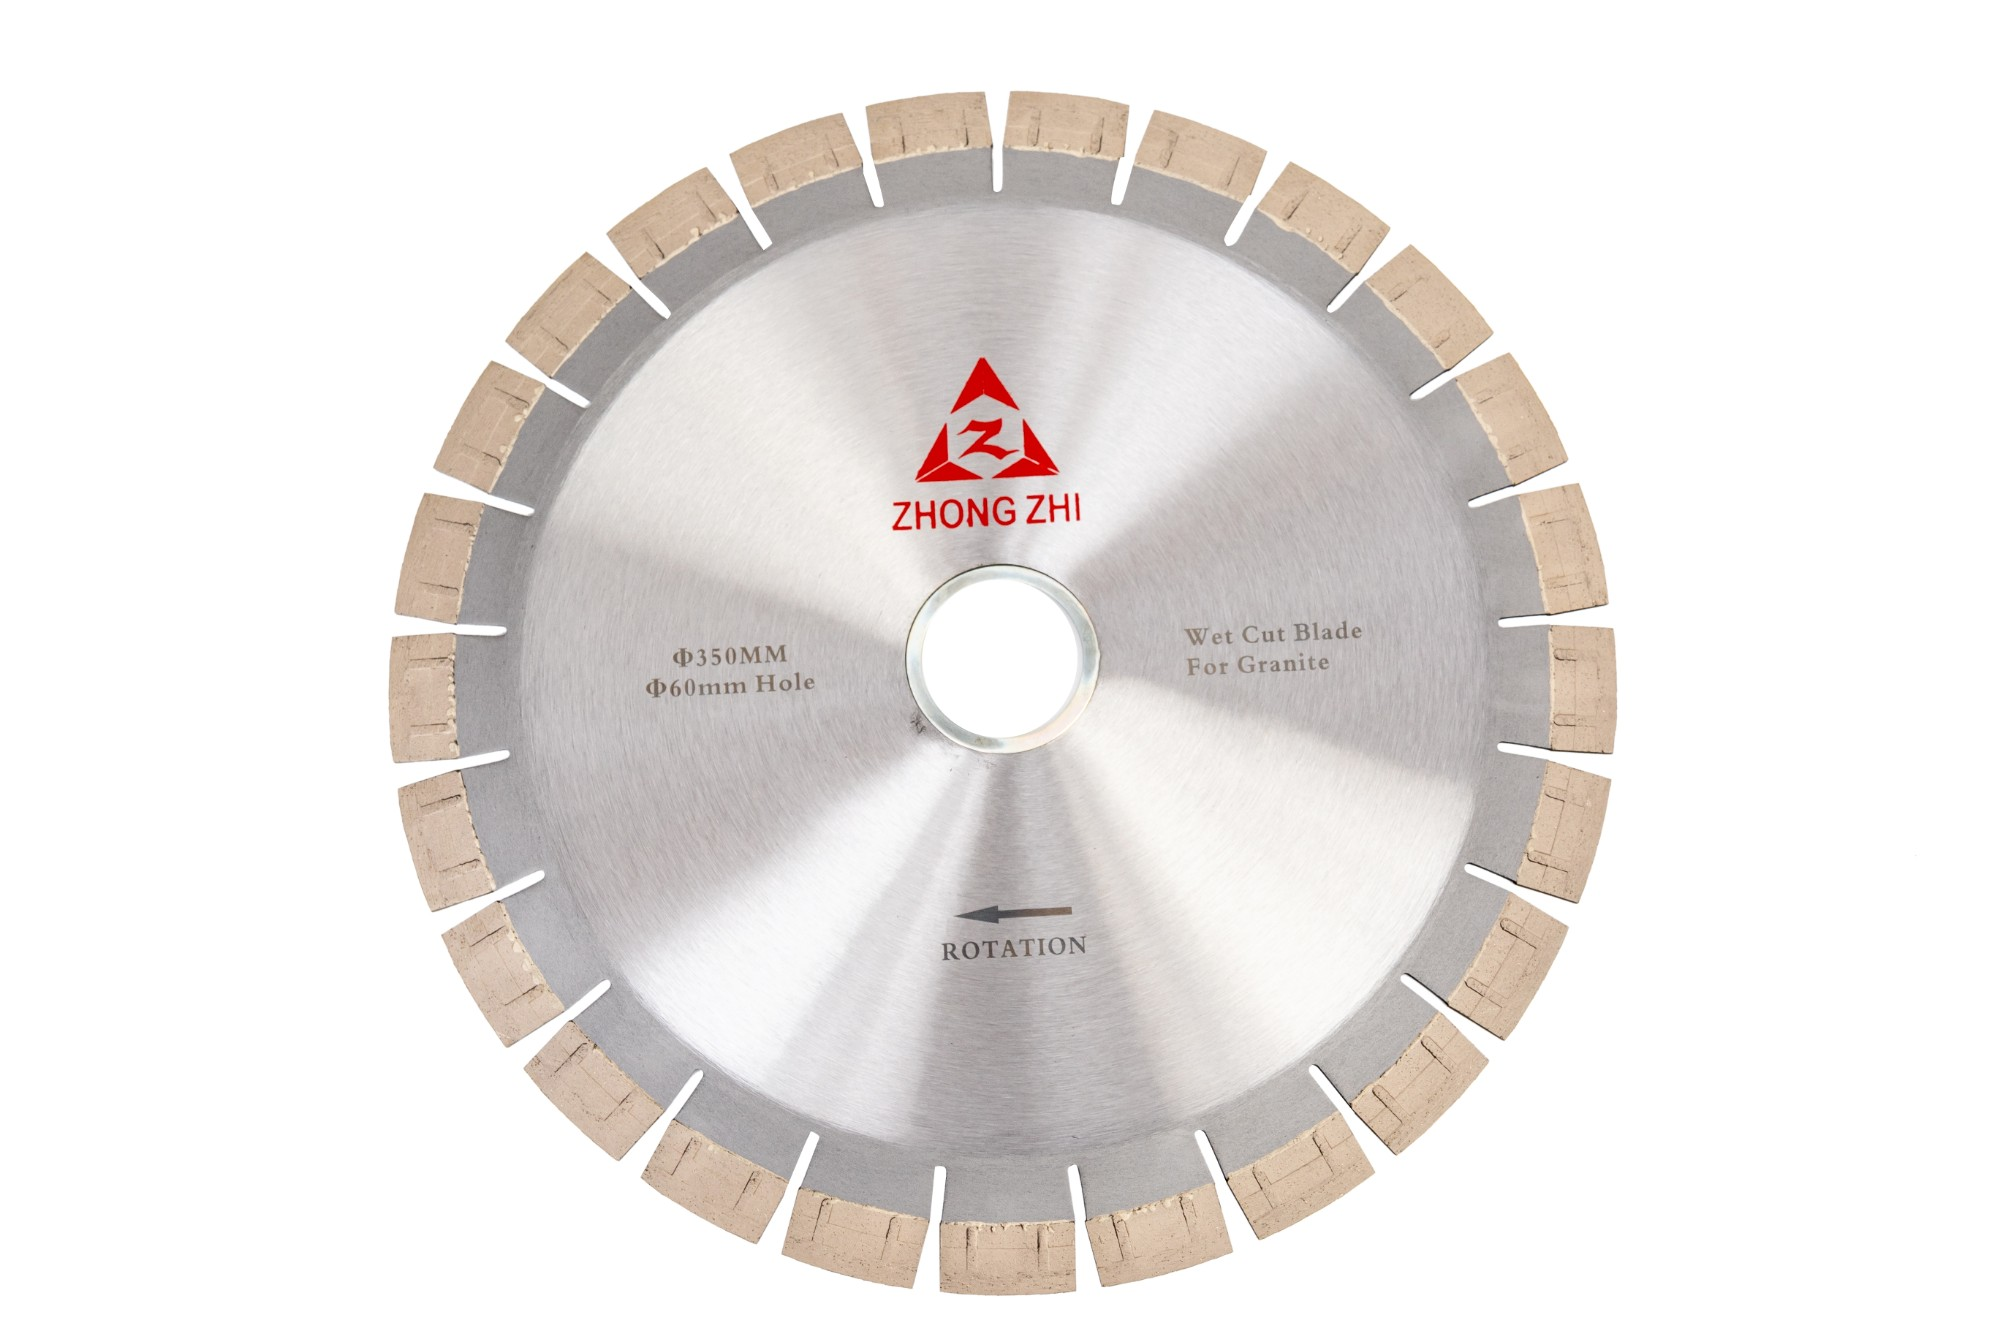 U Shape Fast Diamond Circular Cutting Saw Blade for Granite